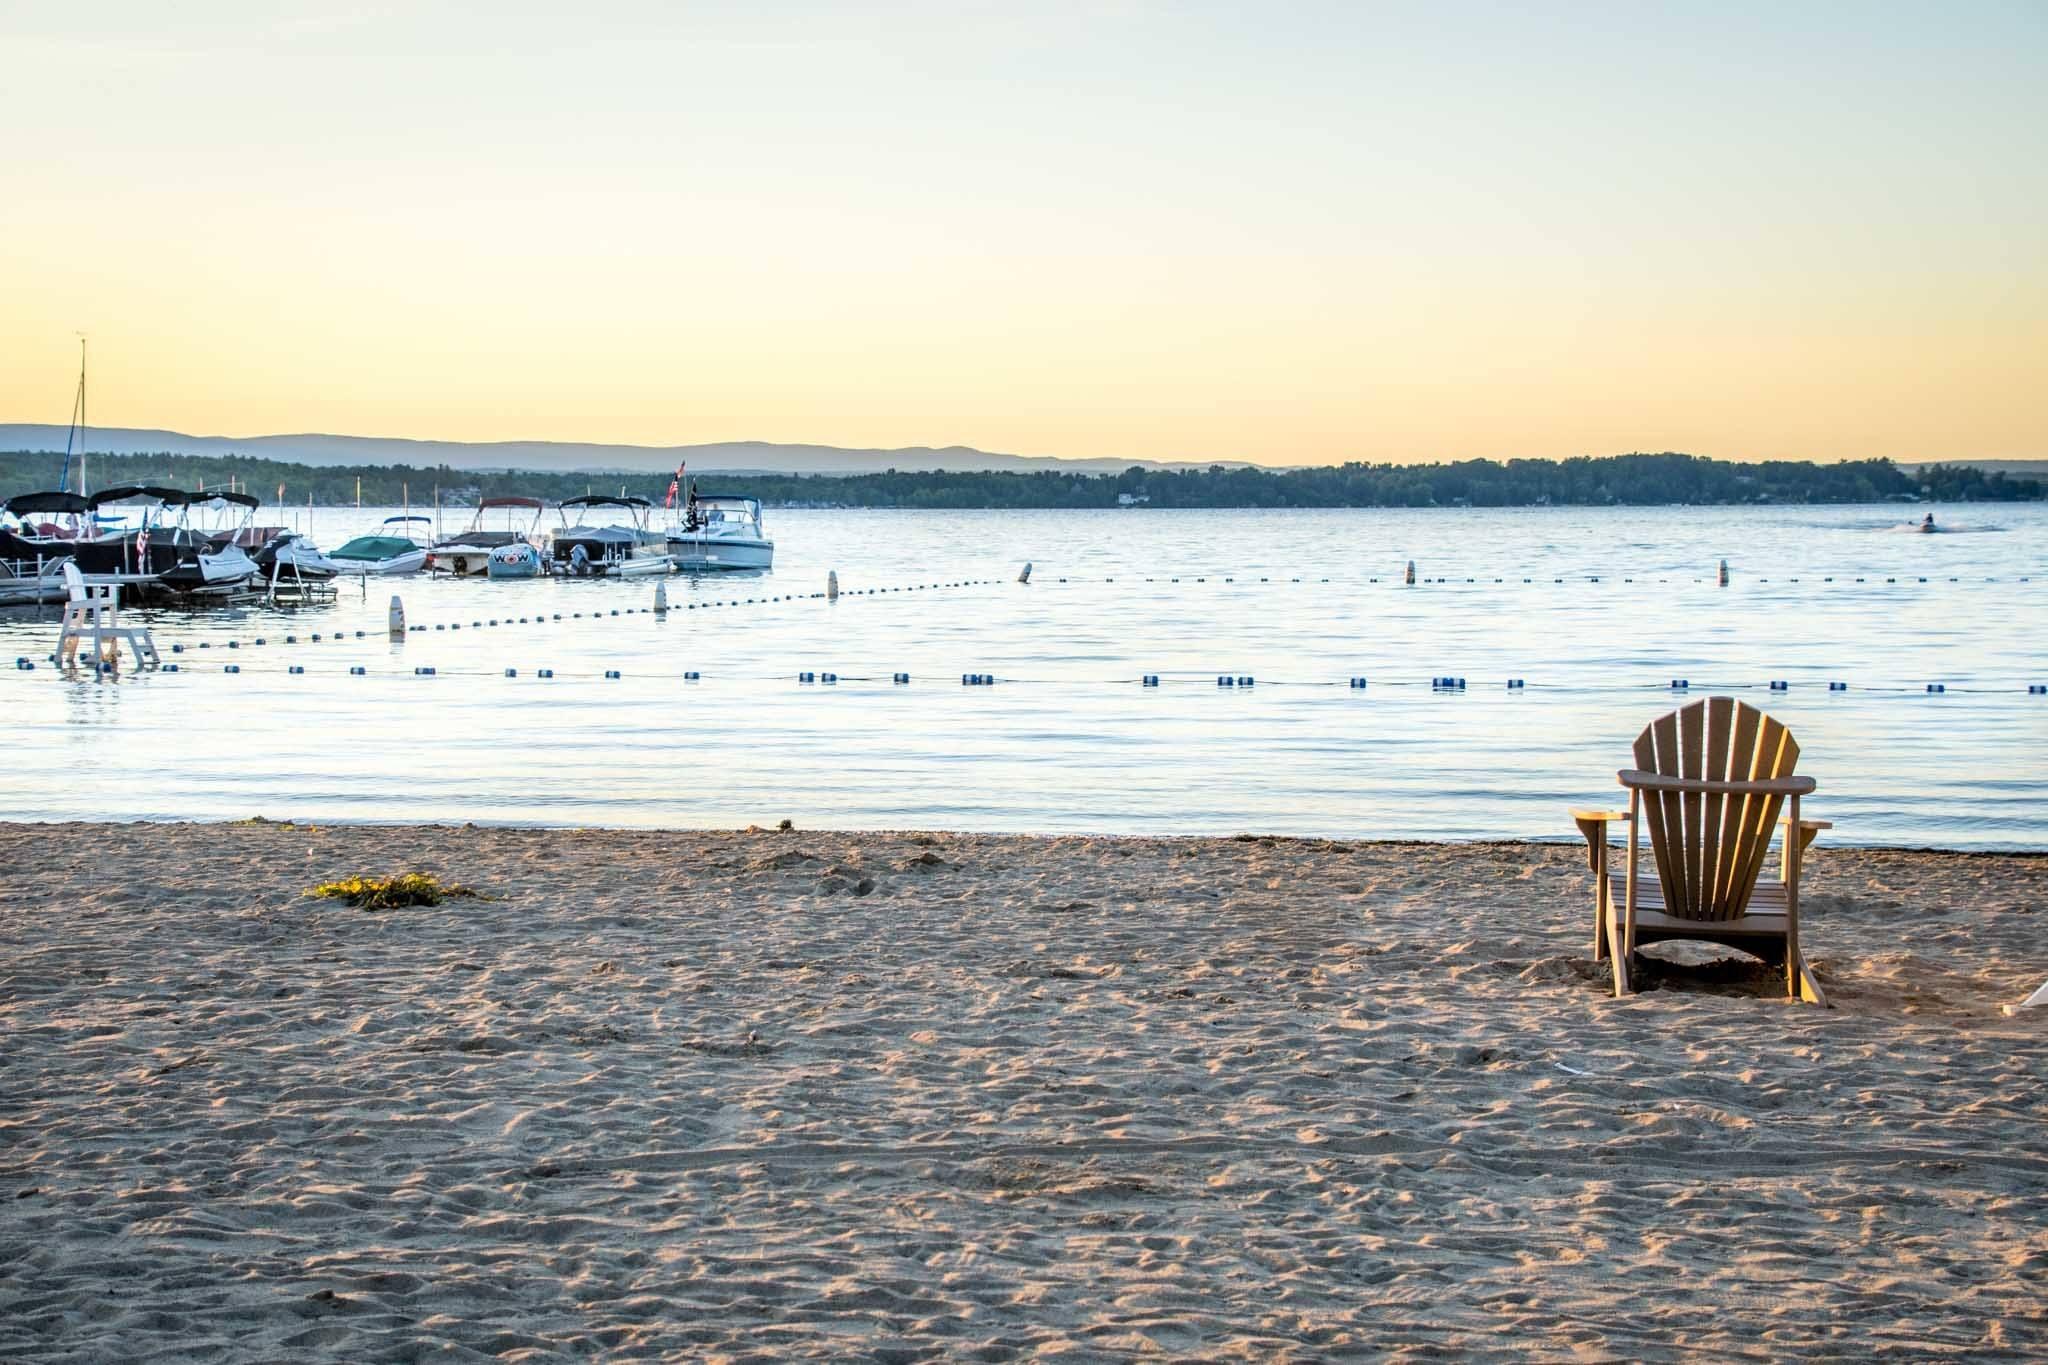 Adirondak chair on a beach by the water